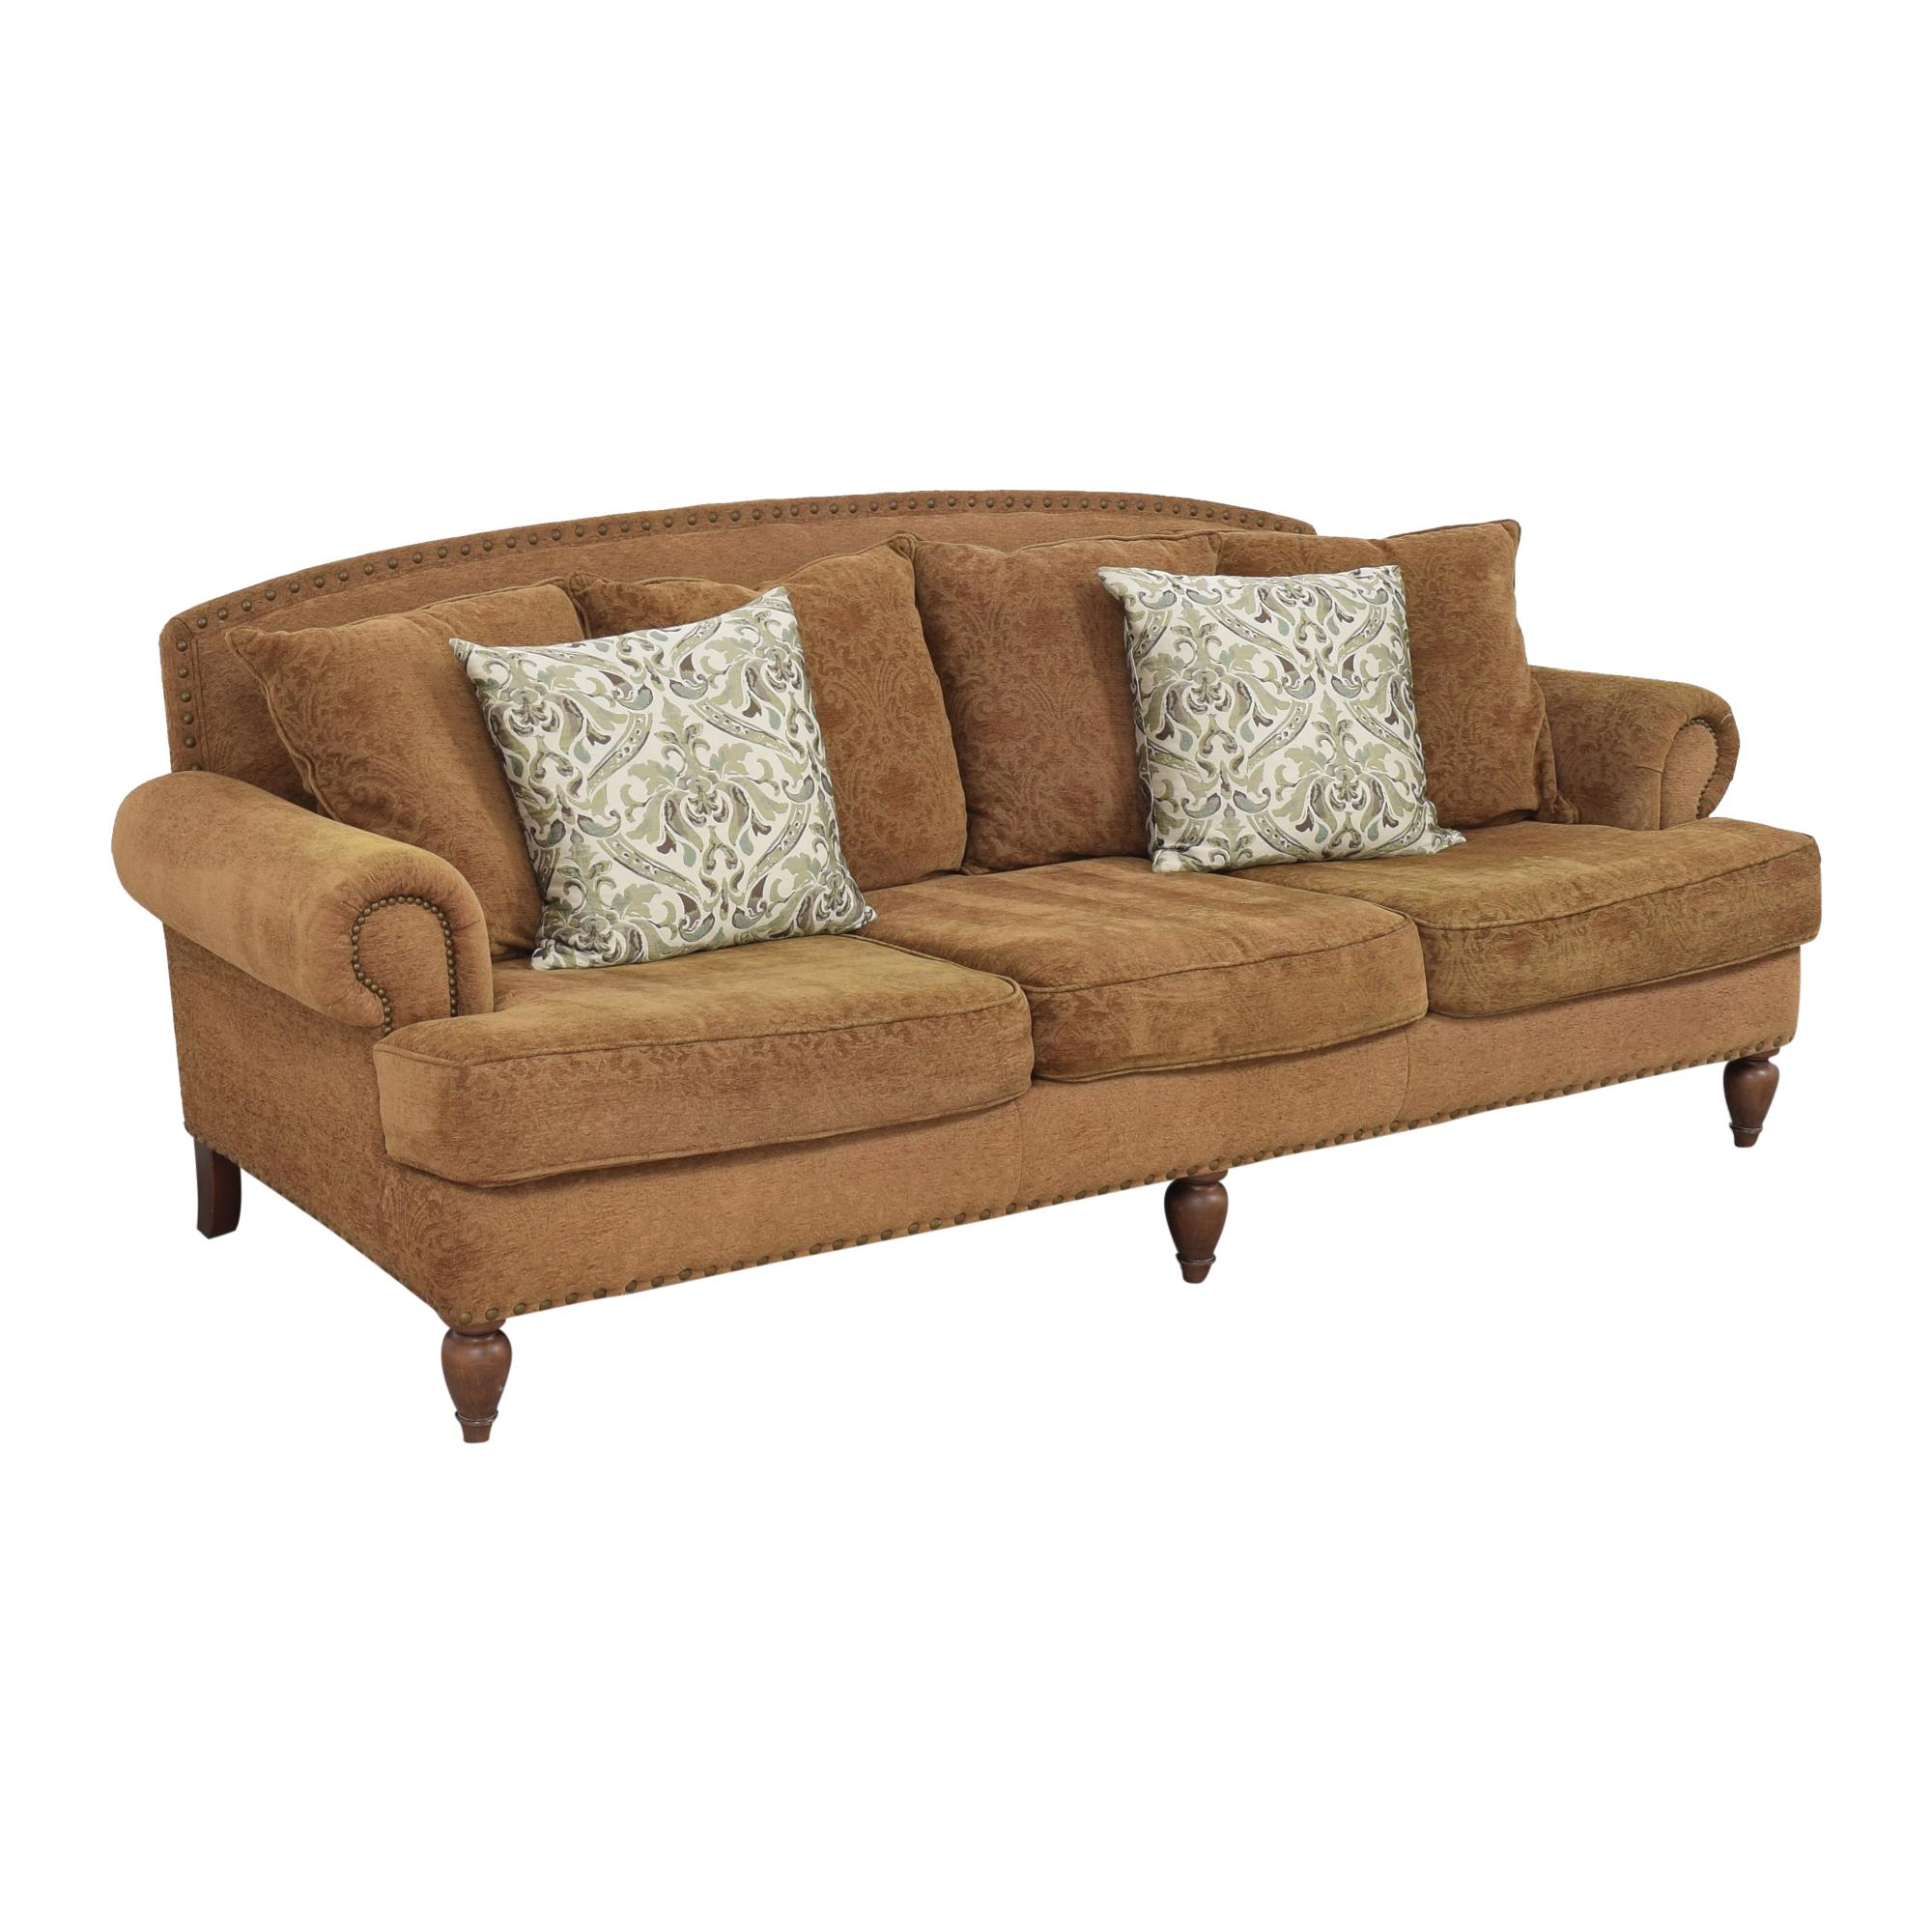 Bernhardt Bernhardt Three Cushion Roll Arm Sofa ma